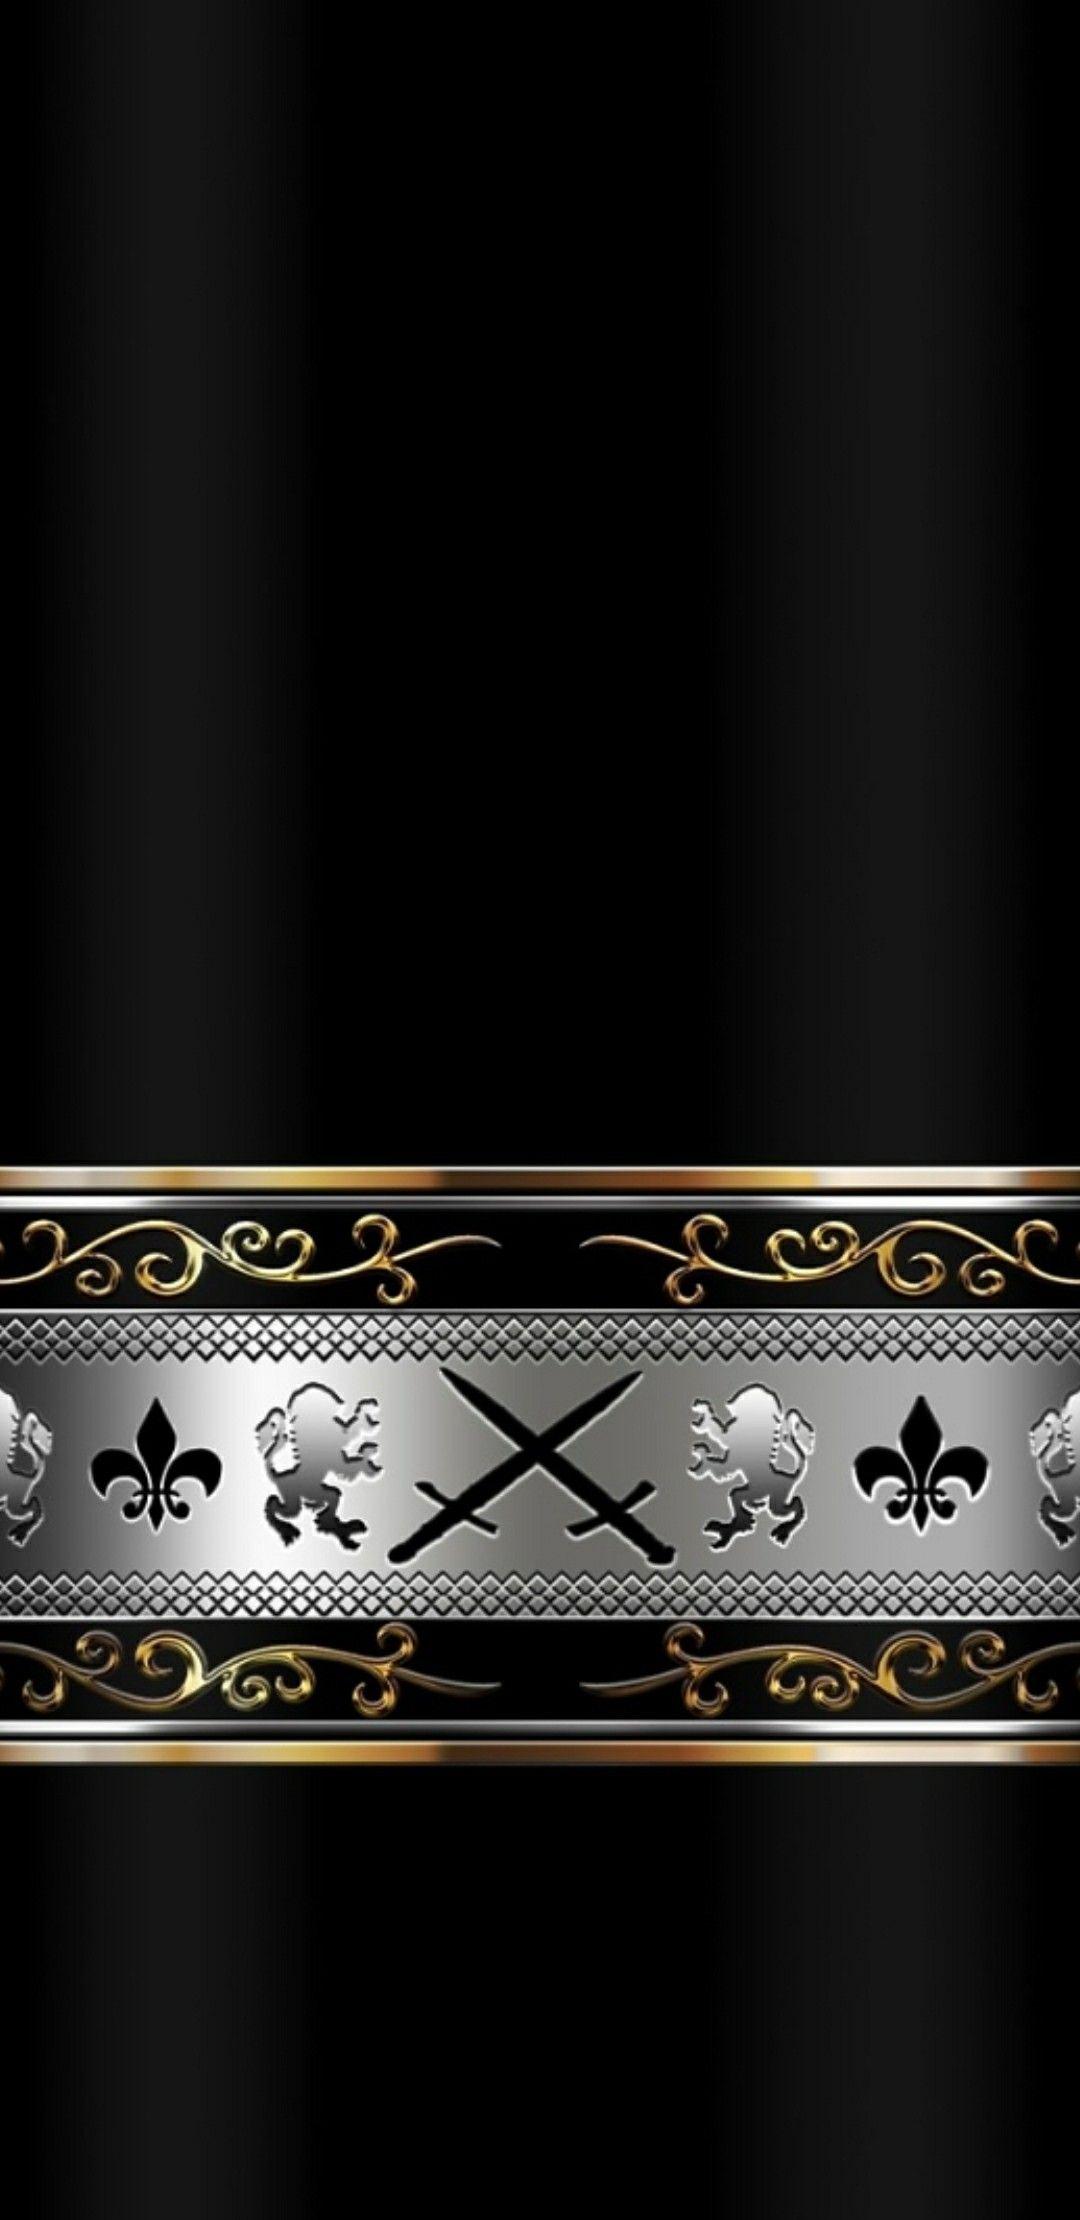 Pin by Susan on black gold silver & white Pinterest